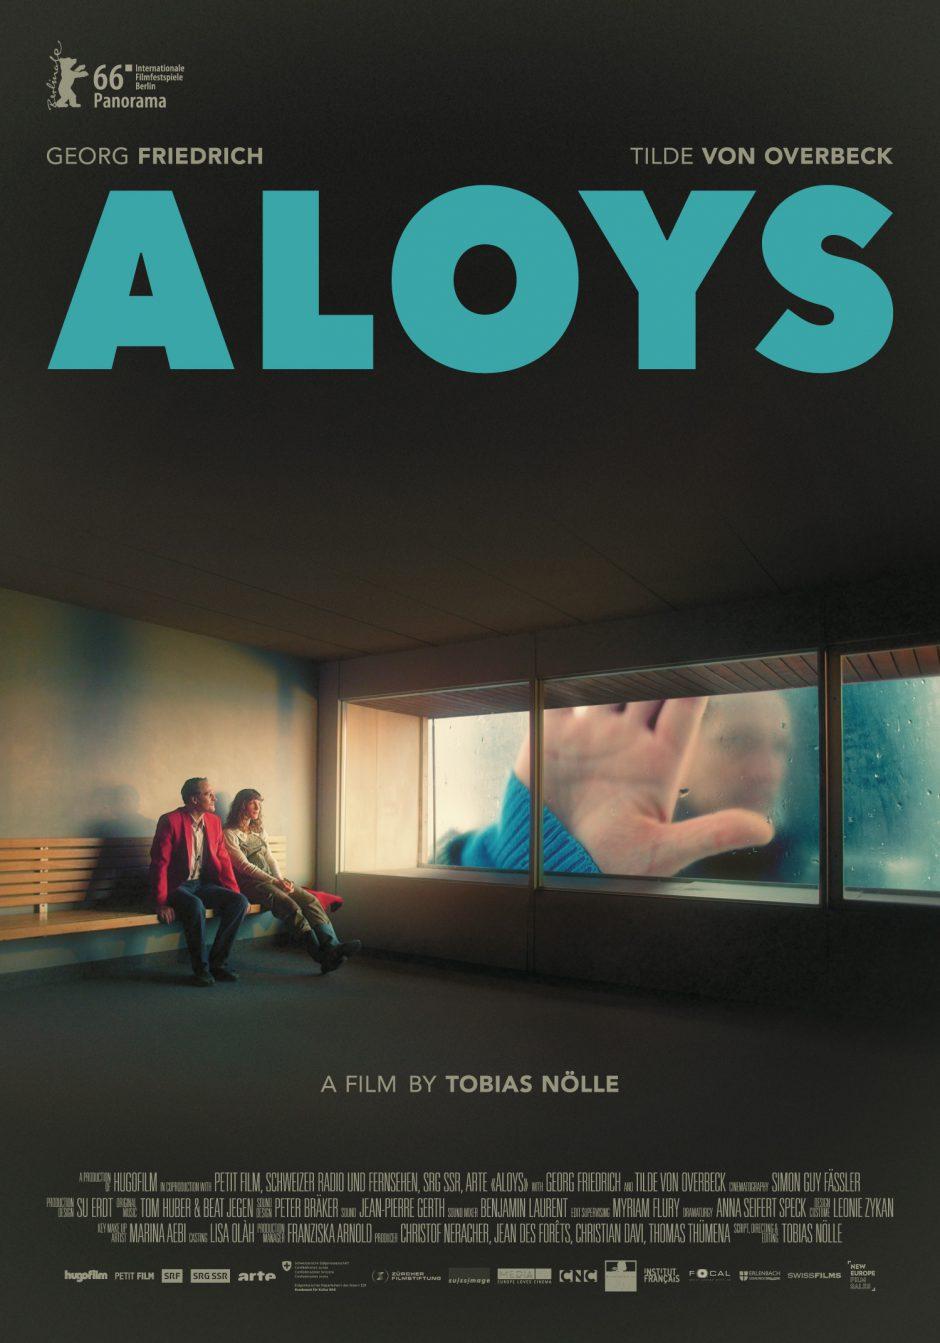 360º Film Marketing - Aloys